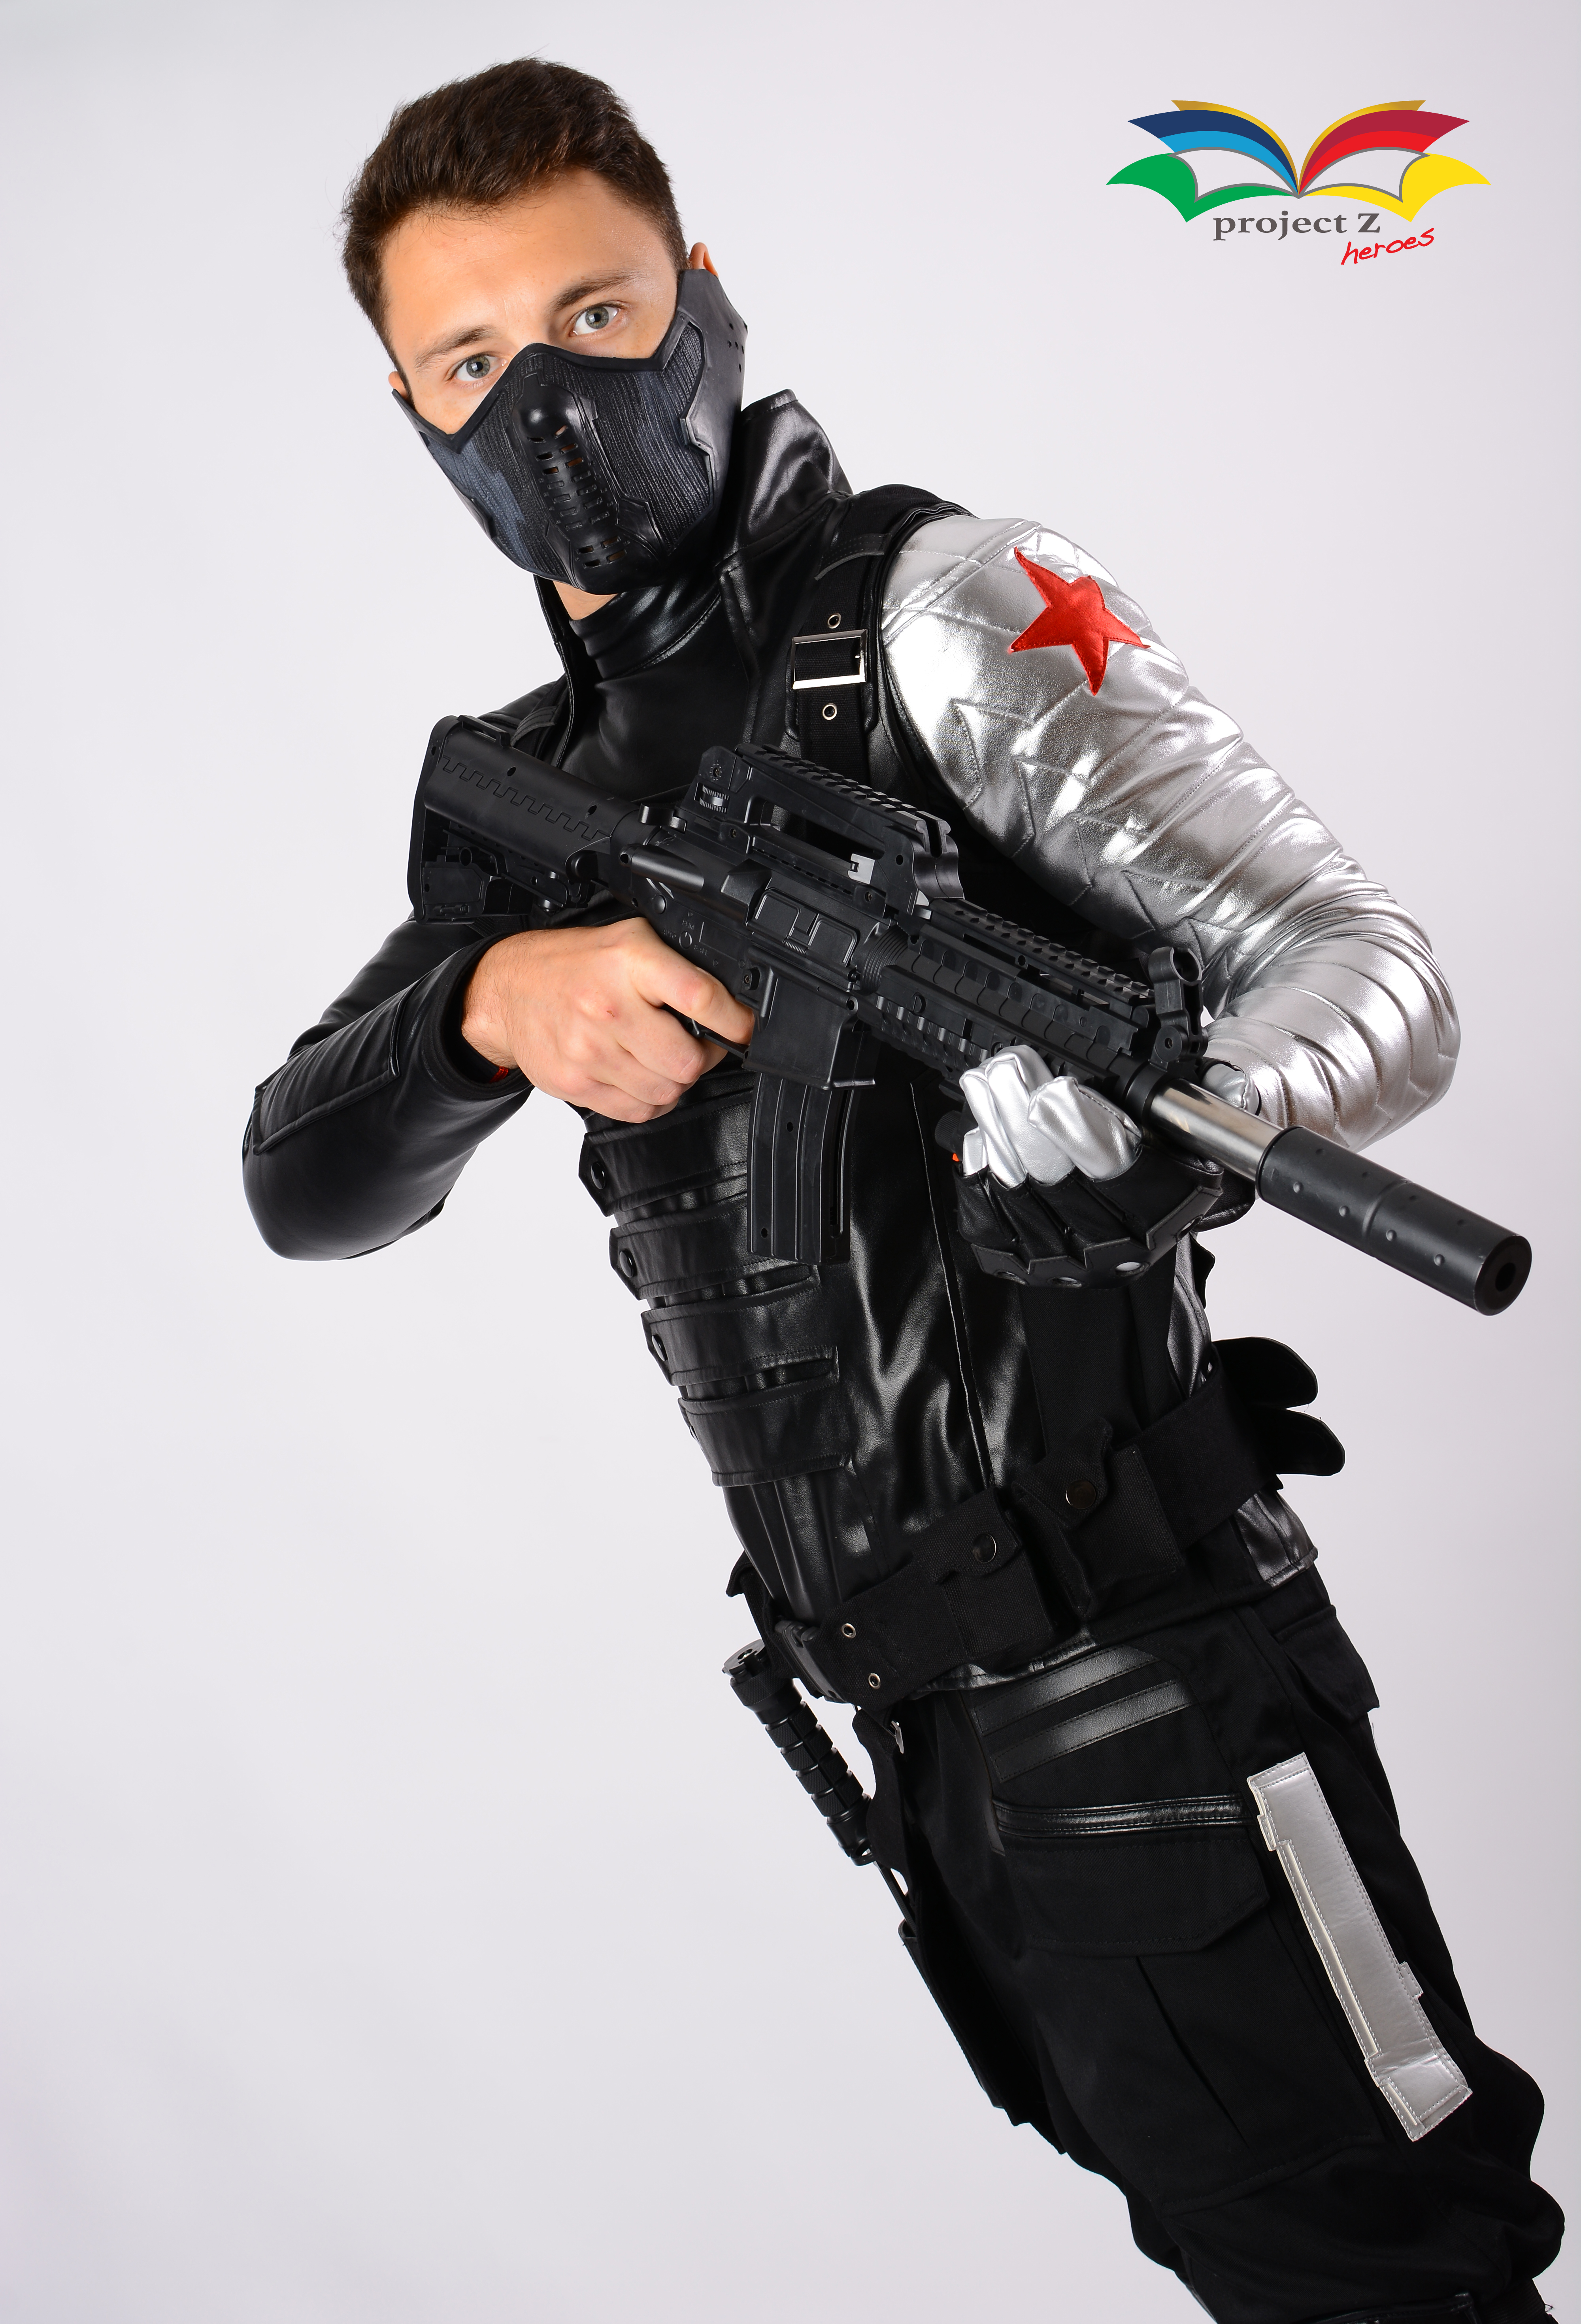 Winter Soldier costume halfbody